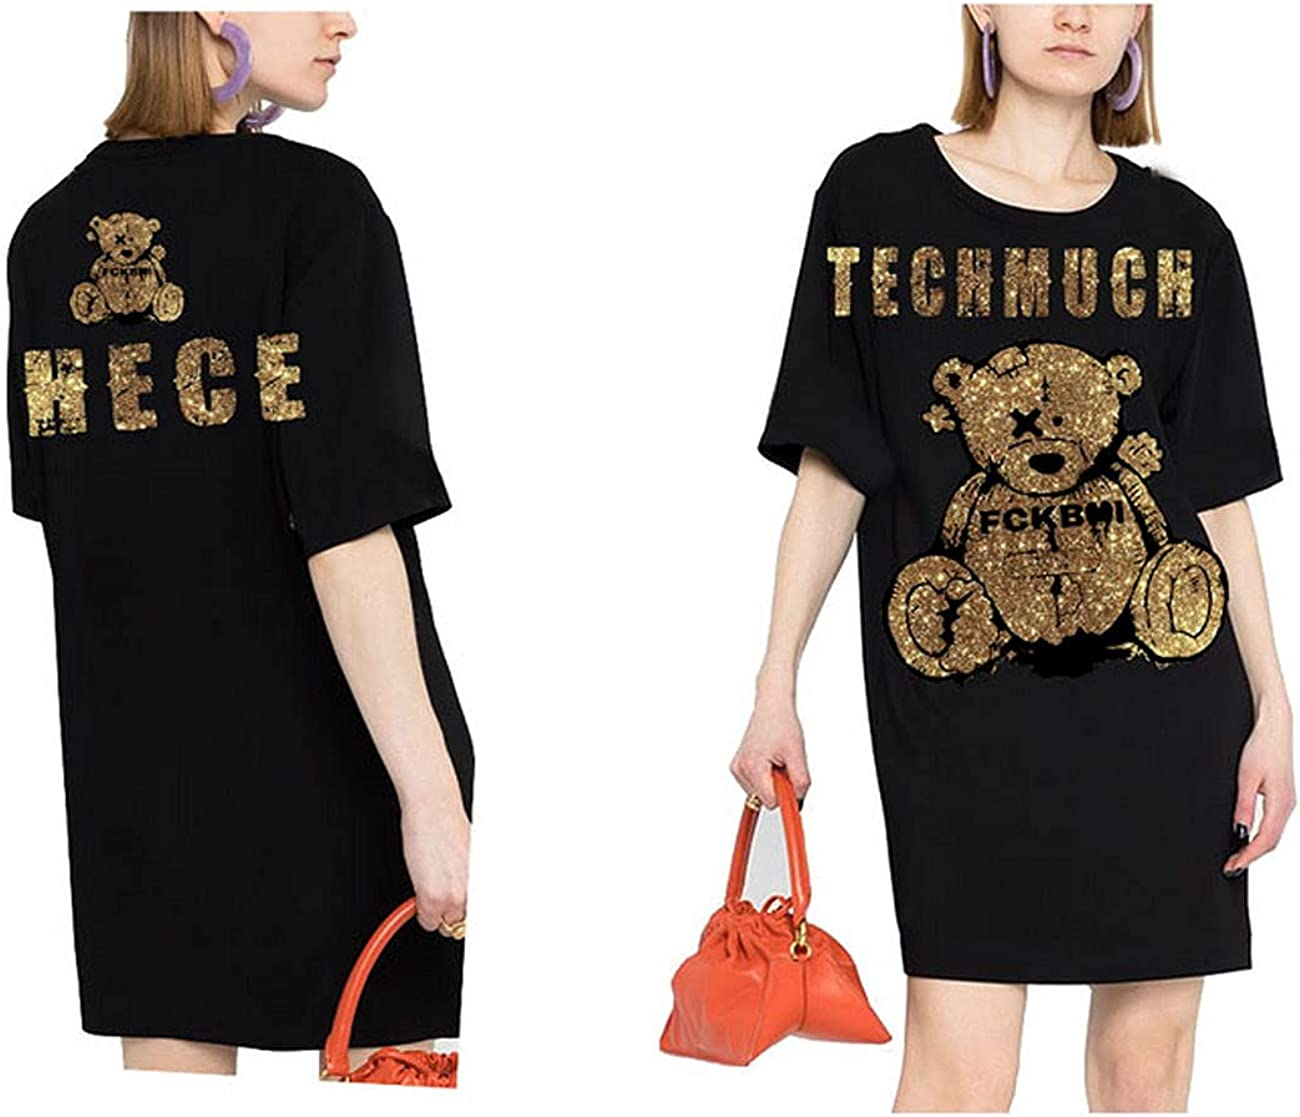 Tide Brand One-Eyed Bear Letters Hot Rhinestone Black Short Sleeve T-Shirt T21110C6193